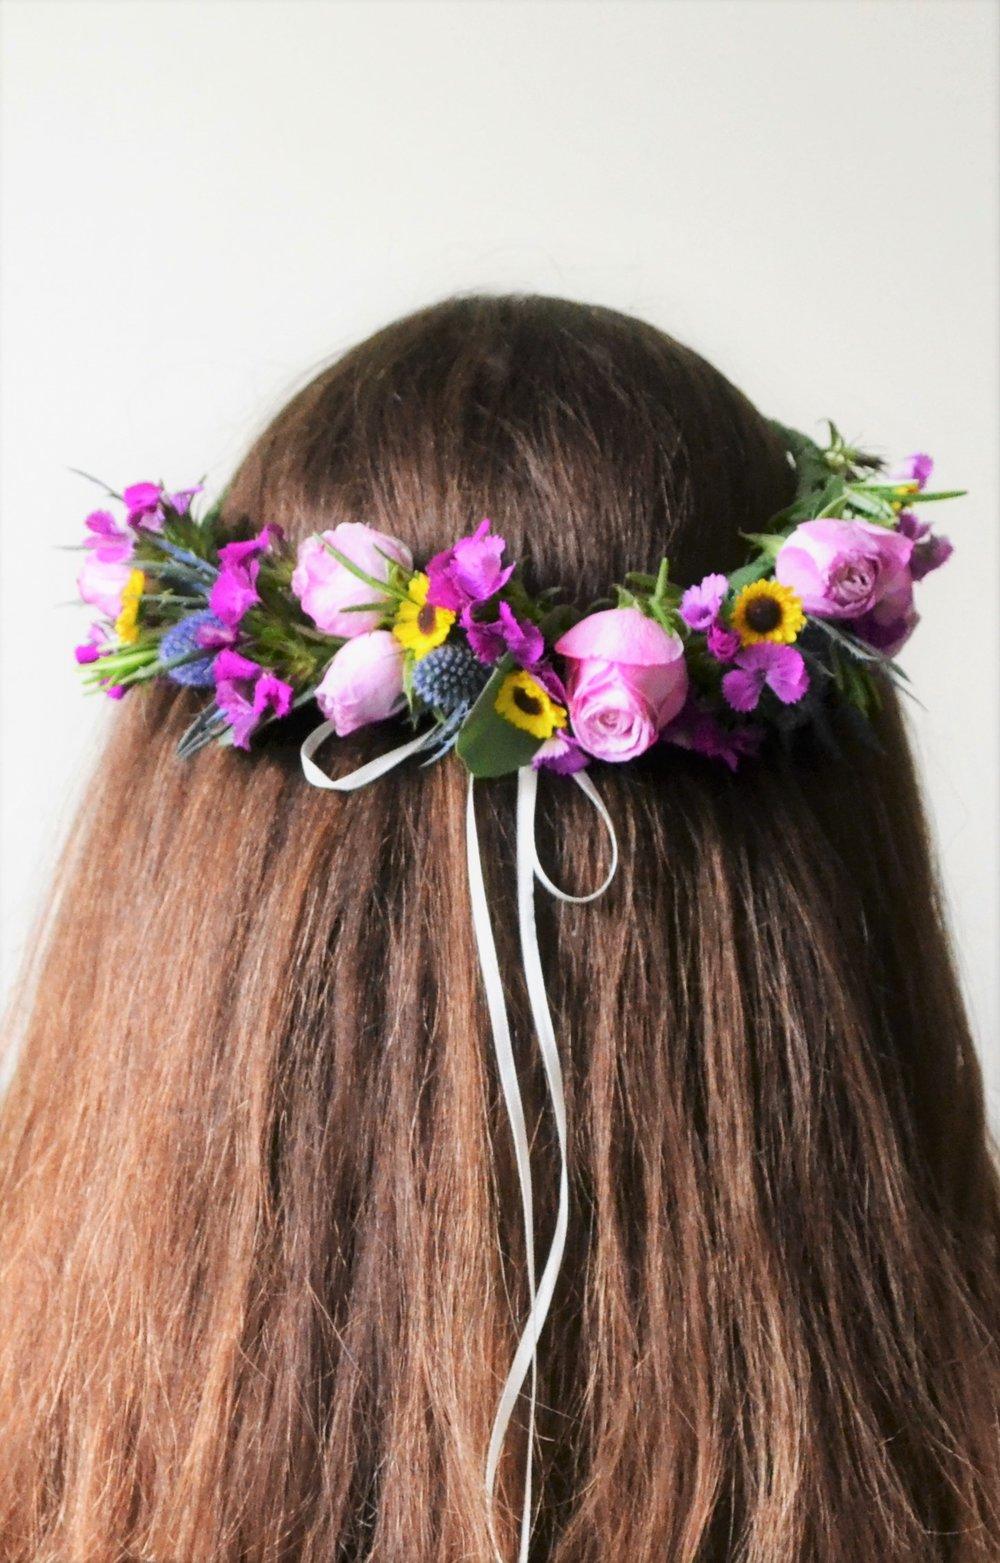 Webb-and-Farrer-Flower-Crown-DIY--Hen-Party-Workshop-Brighton (8).JPG